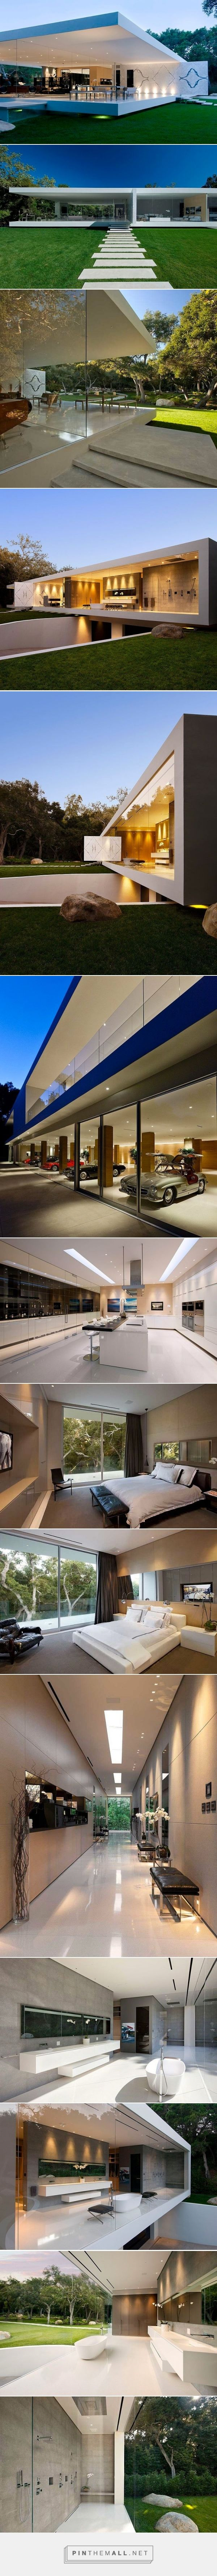 The Glass Pavilion by Steve Hermann let